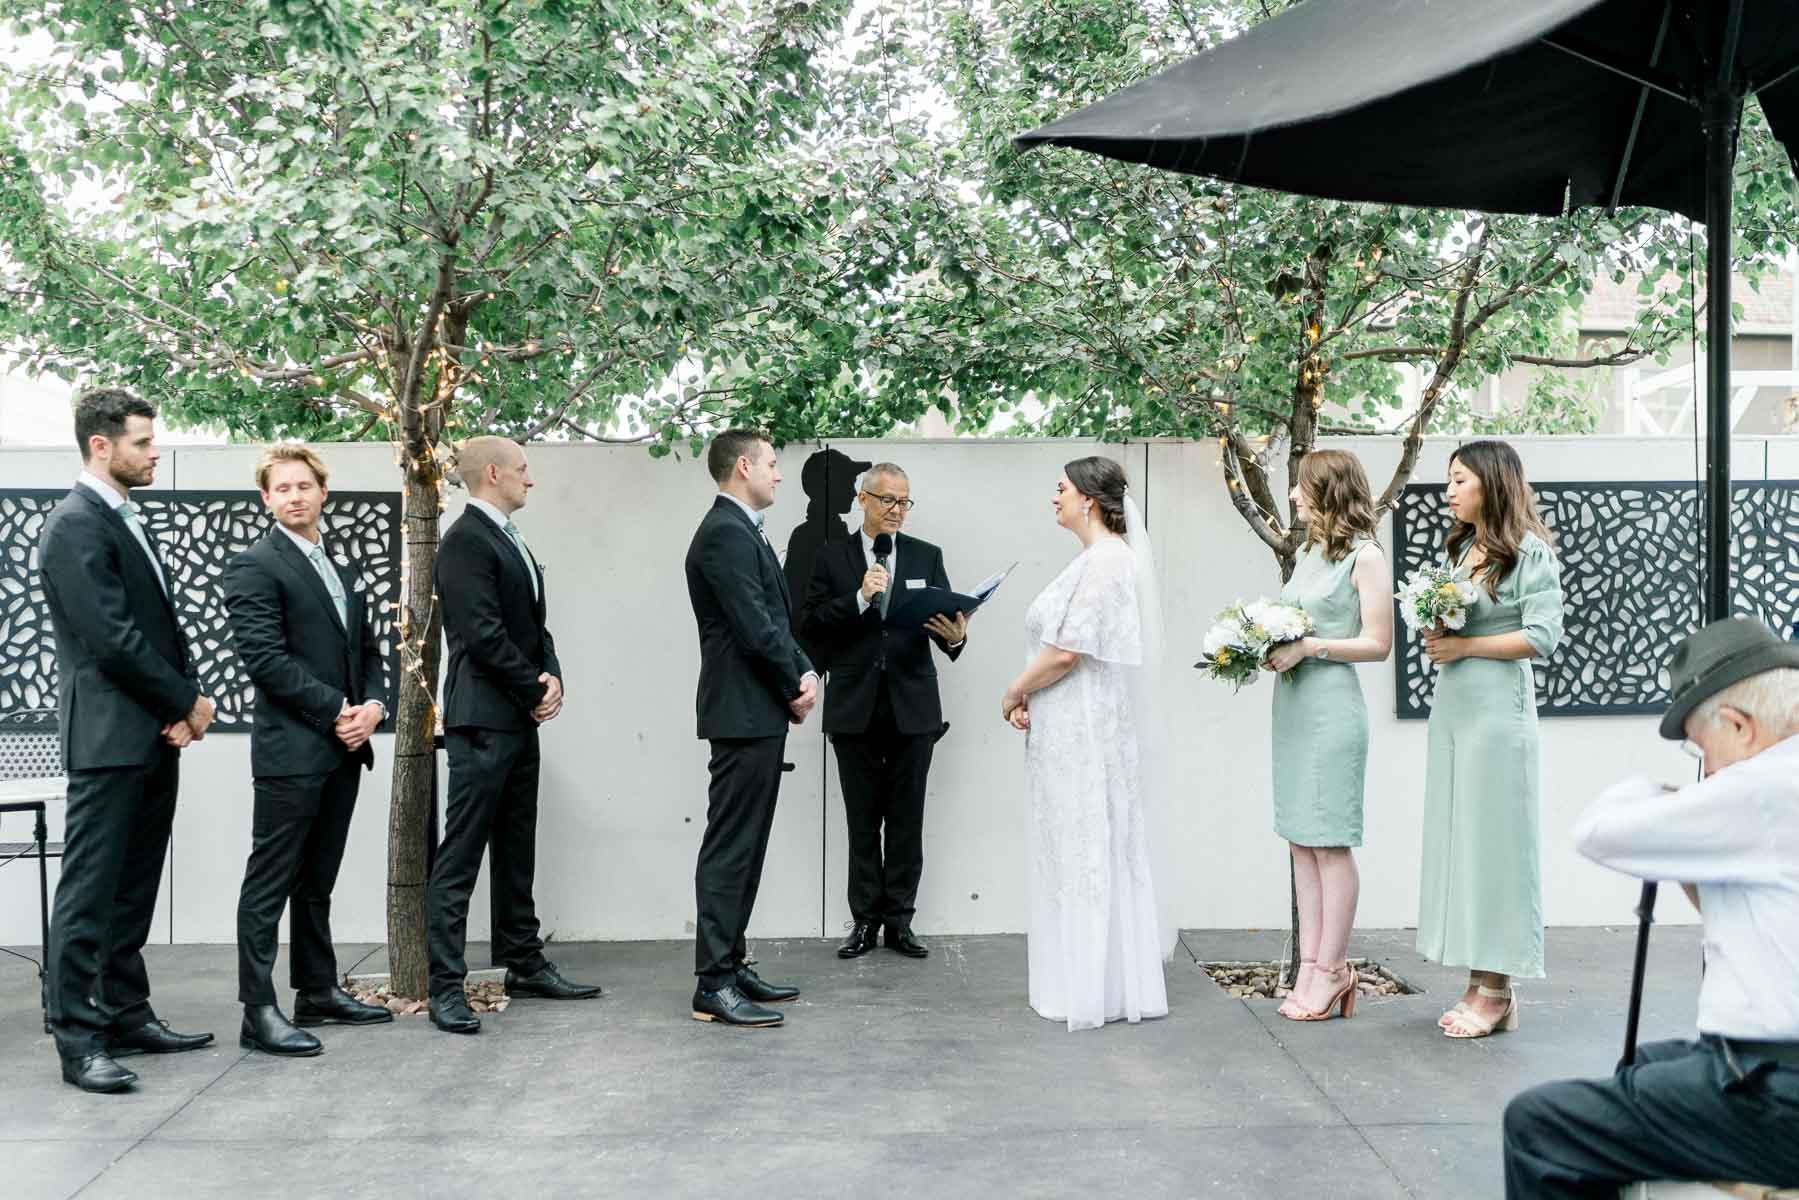 little-henri-cafe-wedding-thornbury-heart+soul-weddings-jane-aaron-05643.jpg